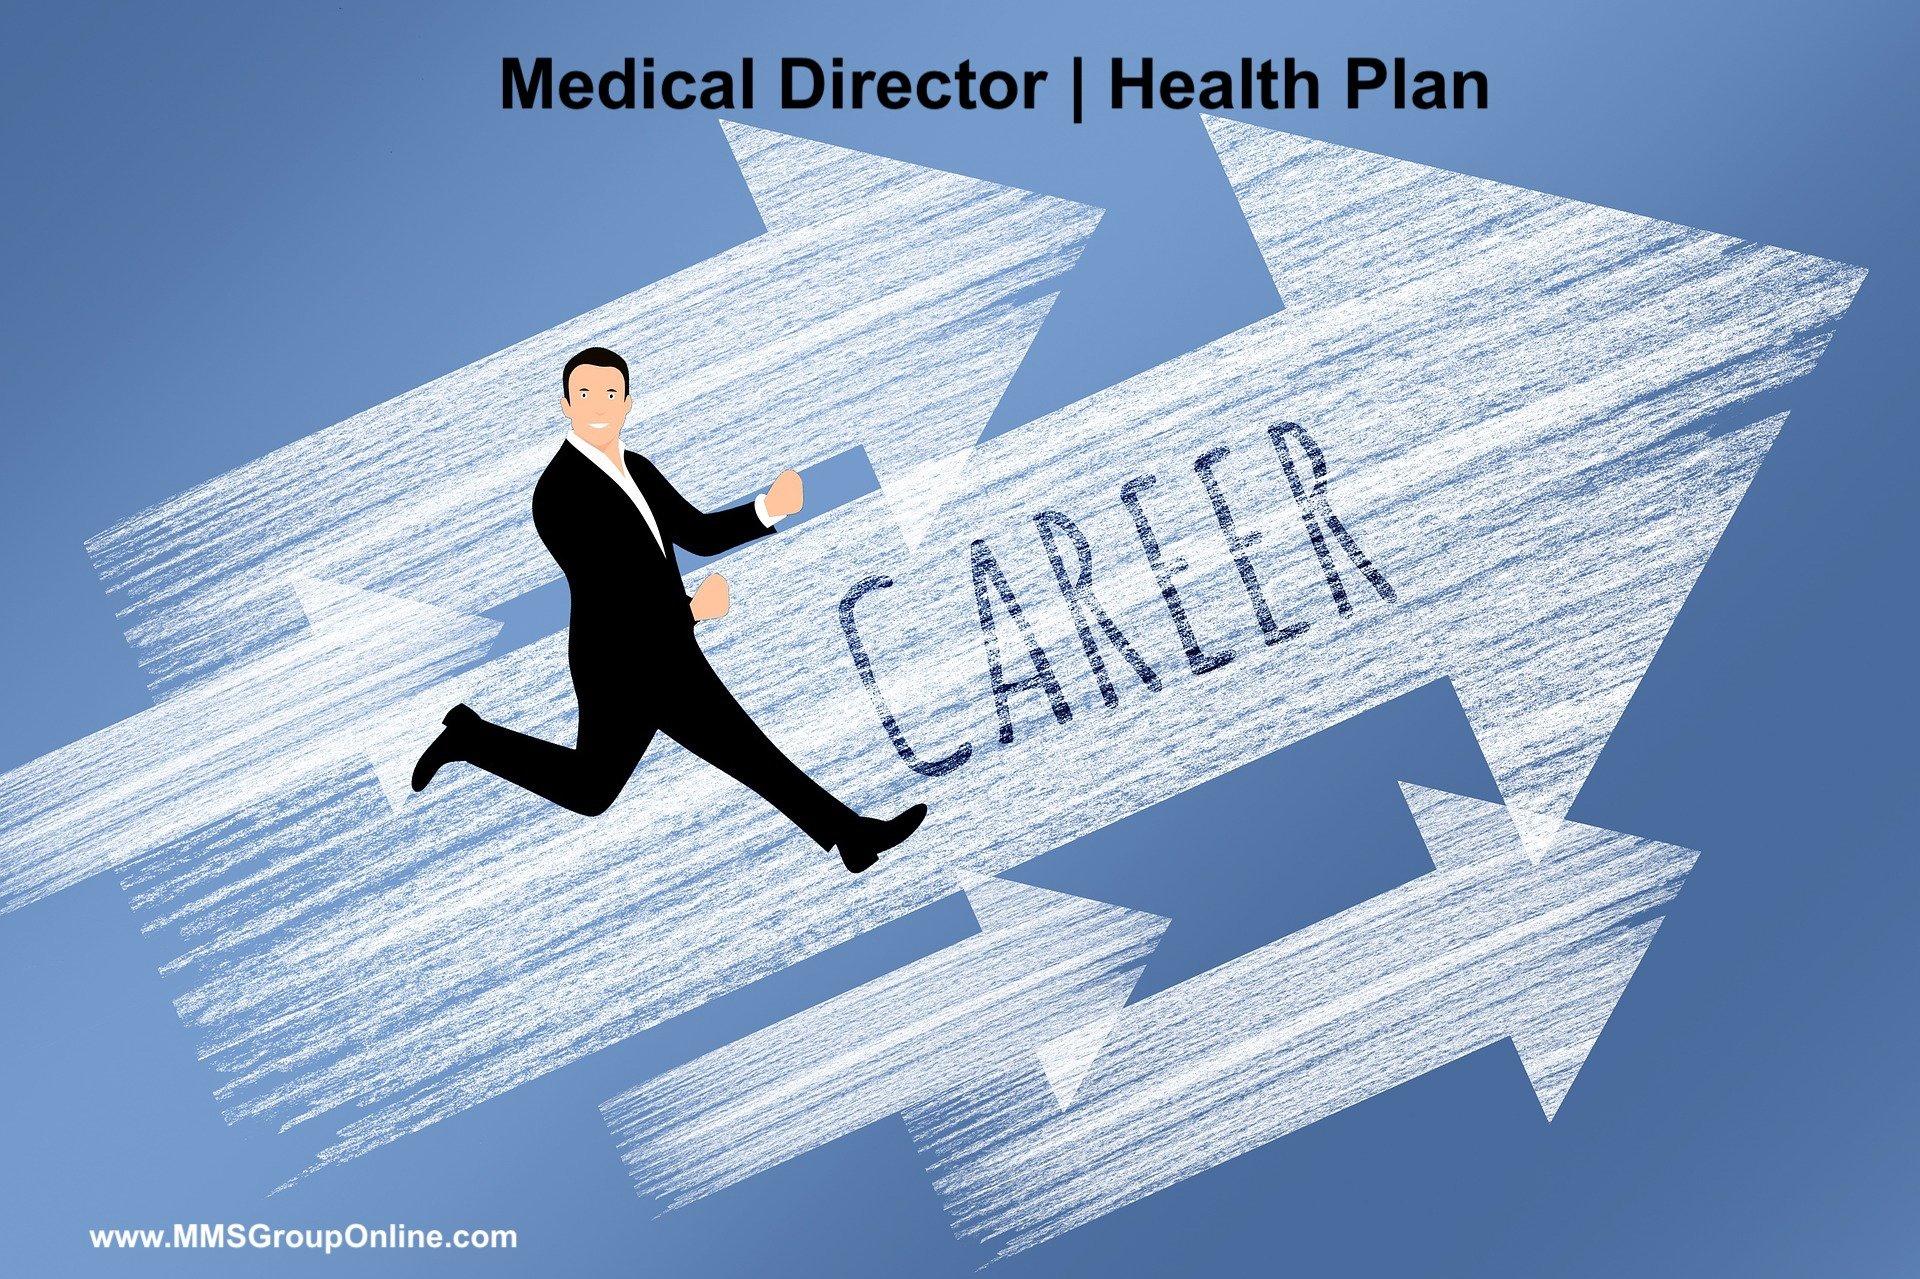 Medical Director Job in Philadelphia or Harrisburg PA